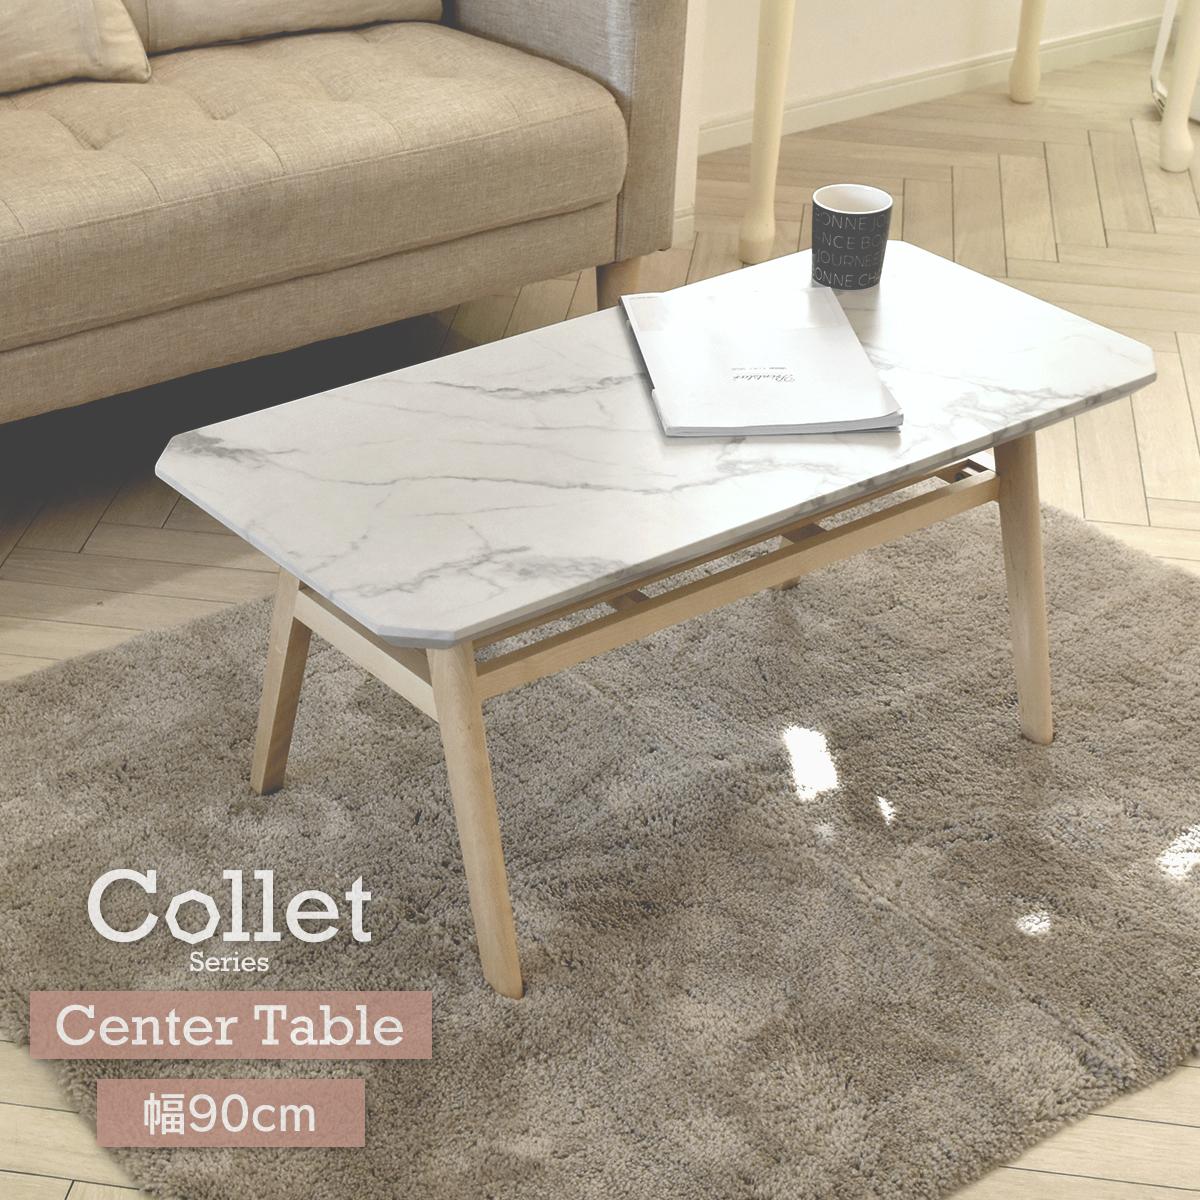 Collet コレット センターテーブル 幅90 COCT-90 長方形 天然木 バーチ材 大理石柄